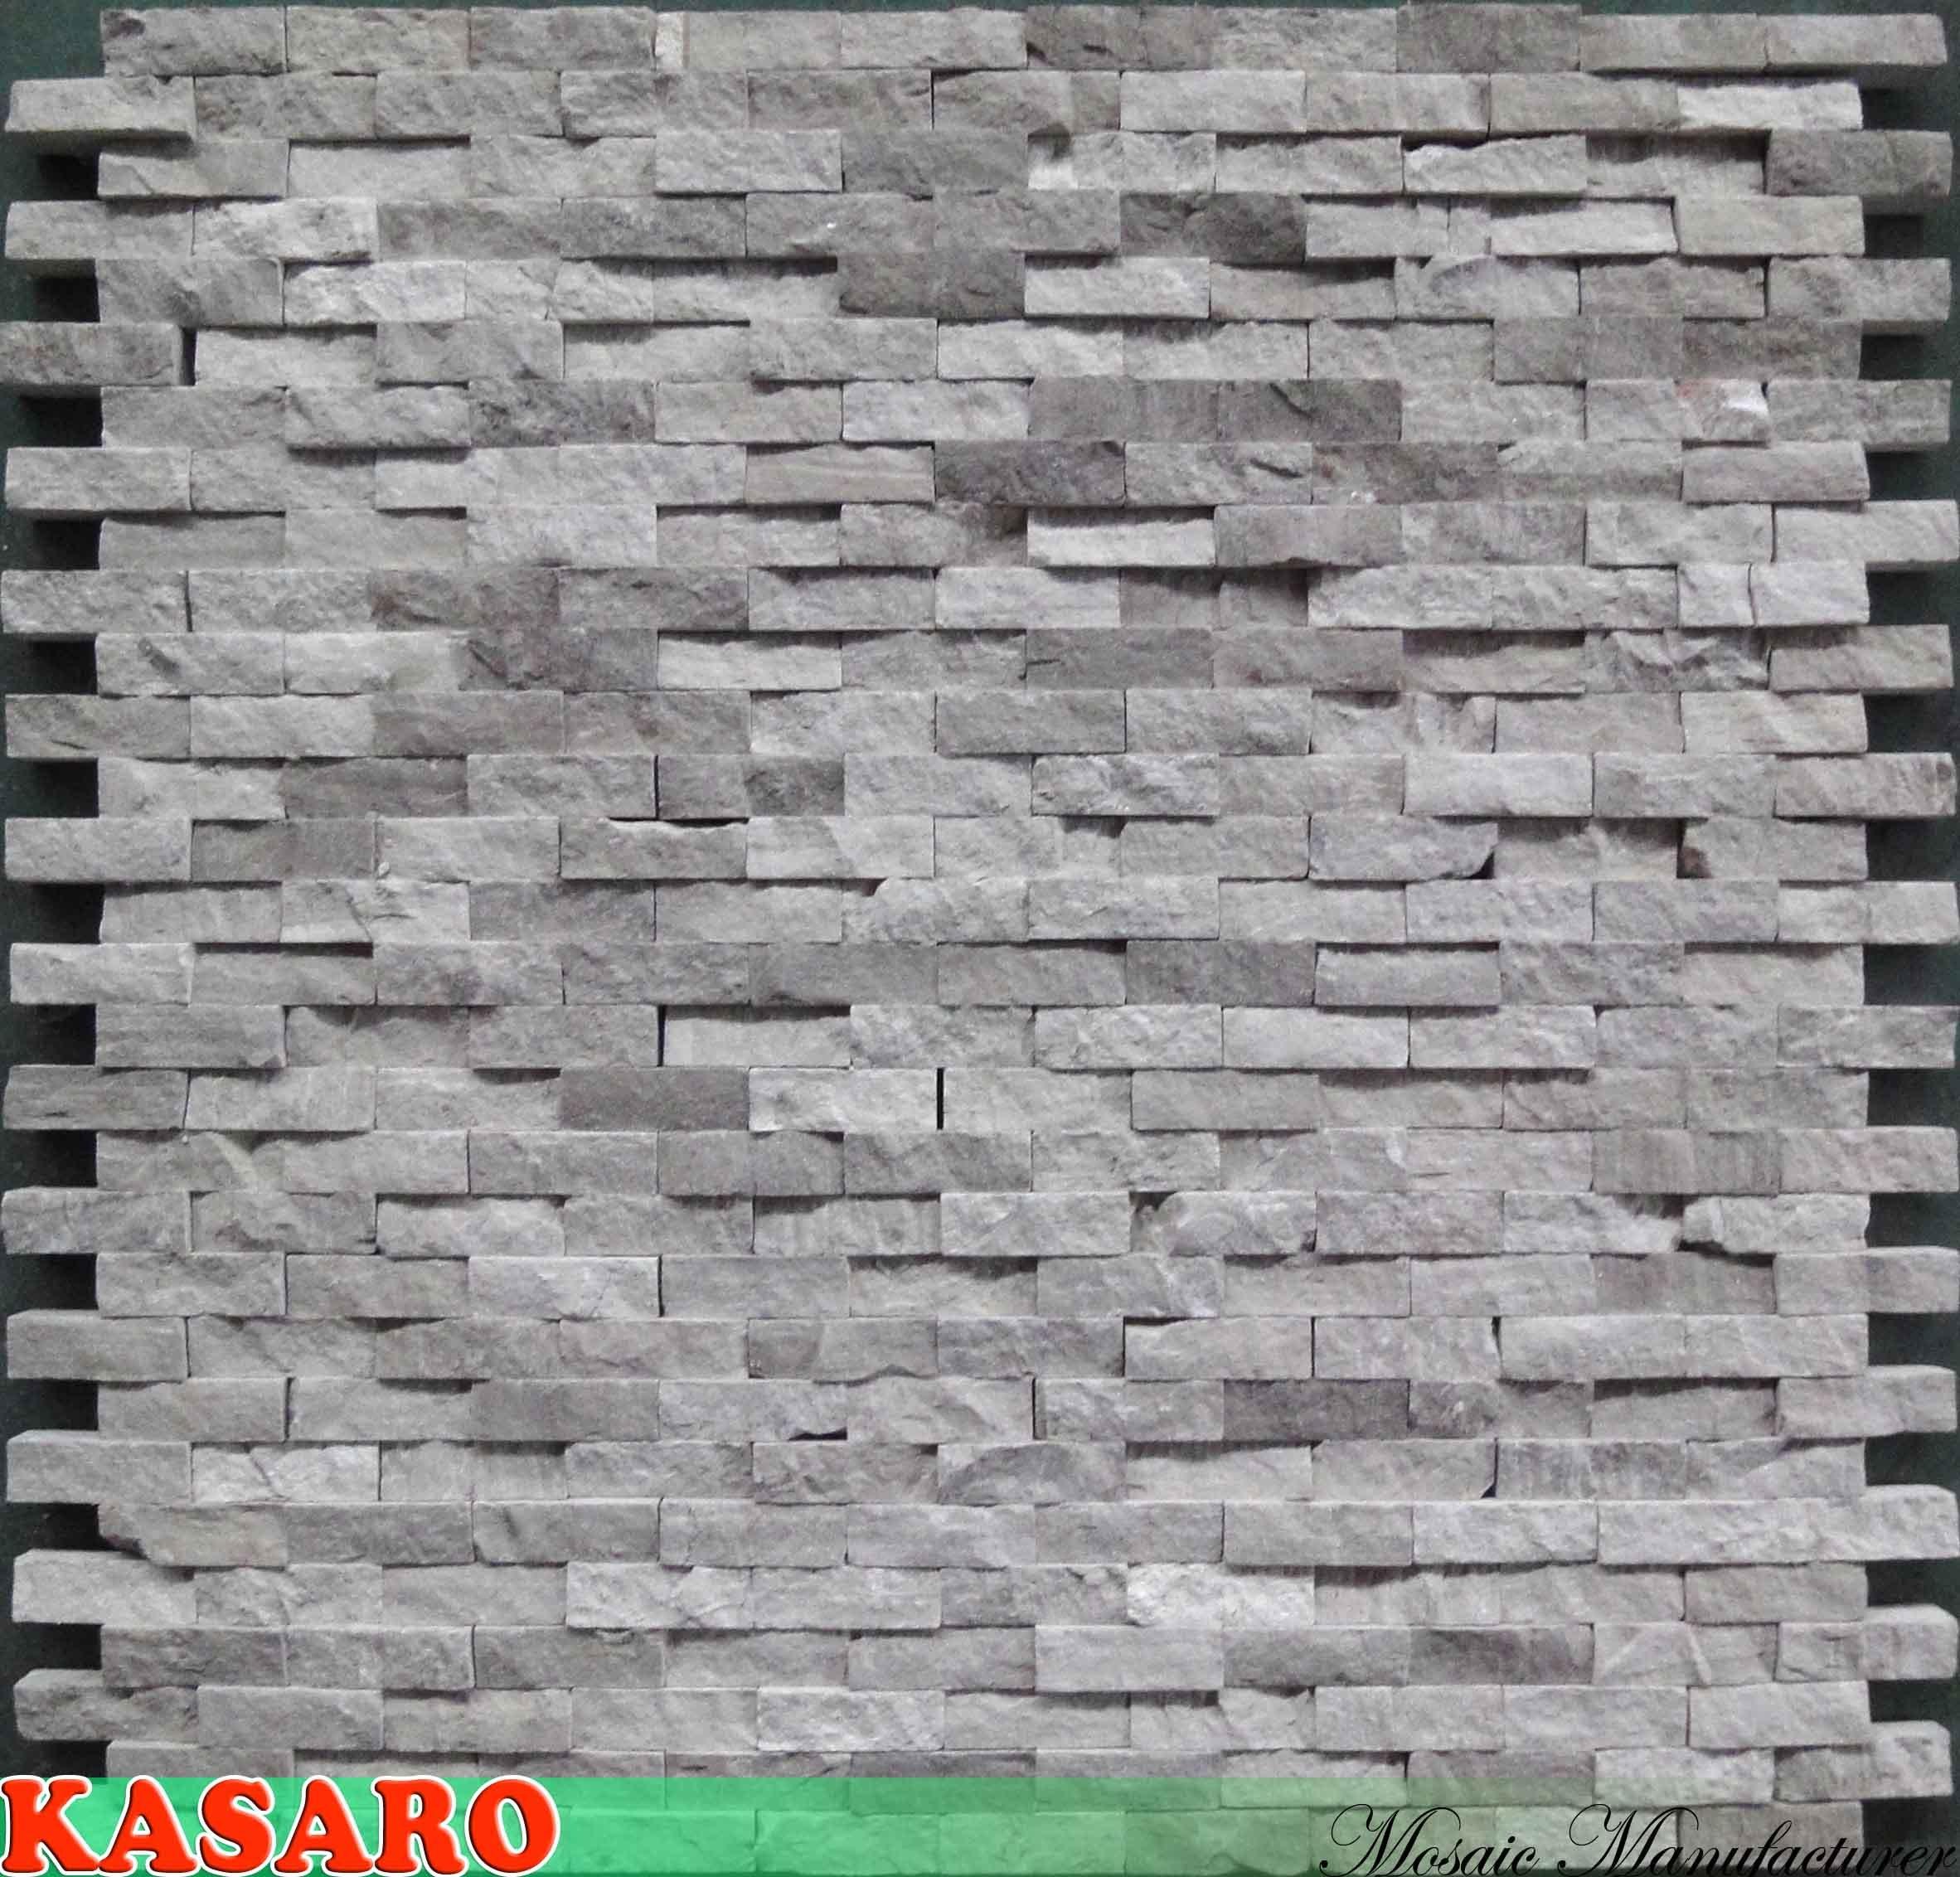 mosa que en pierre naturelle in gale ksl8214 mosa que en pierre naturelle in gale ksl8214. Black Bedroom Furniture Sets. Home Design Ideas